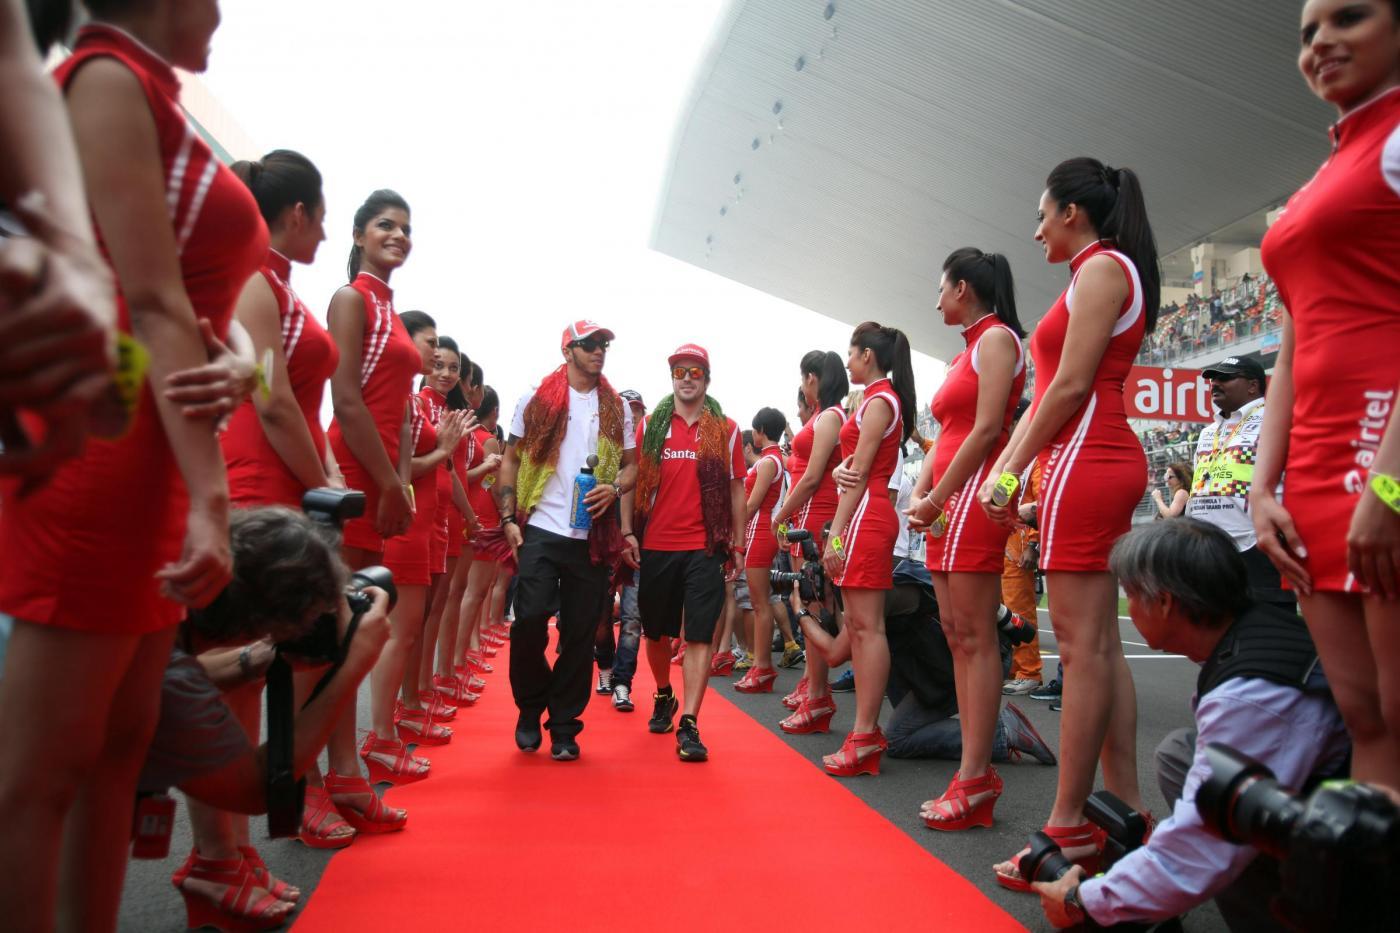 F1-GP-India-2012-foto-ragazze.jpg